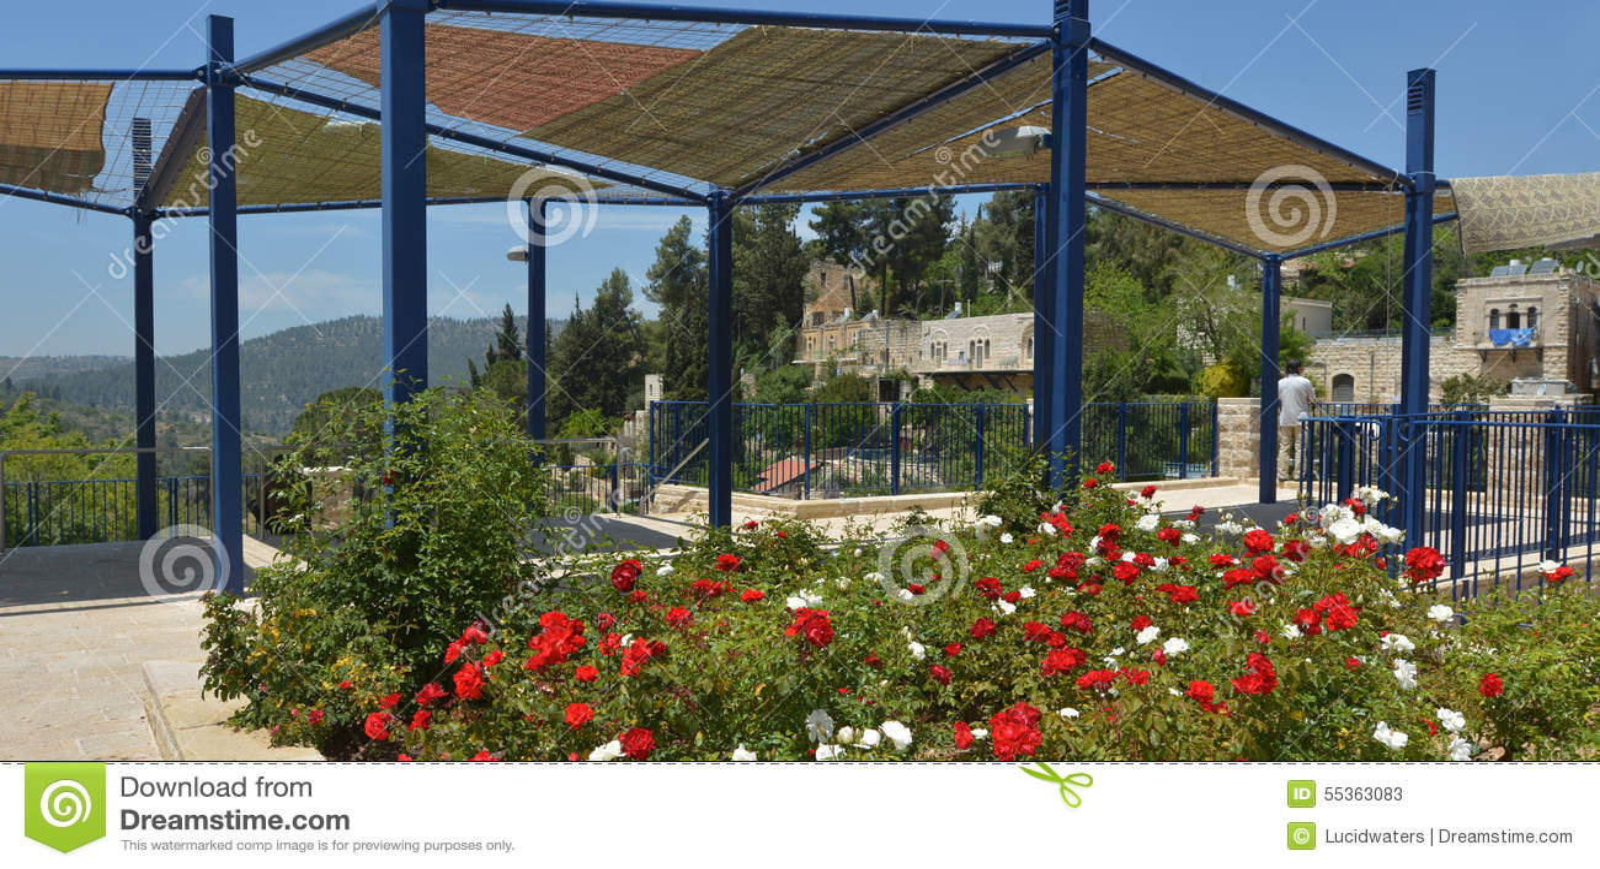 Villaggio di Ein Kerem a Gerusalemme - Israele